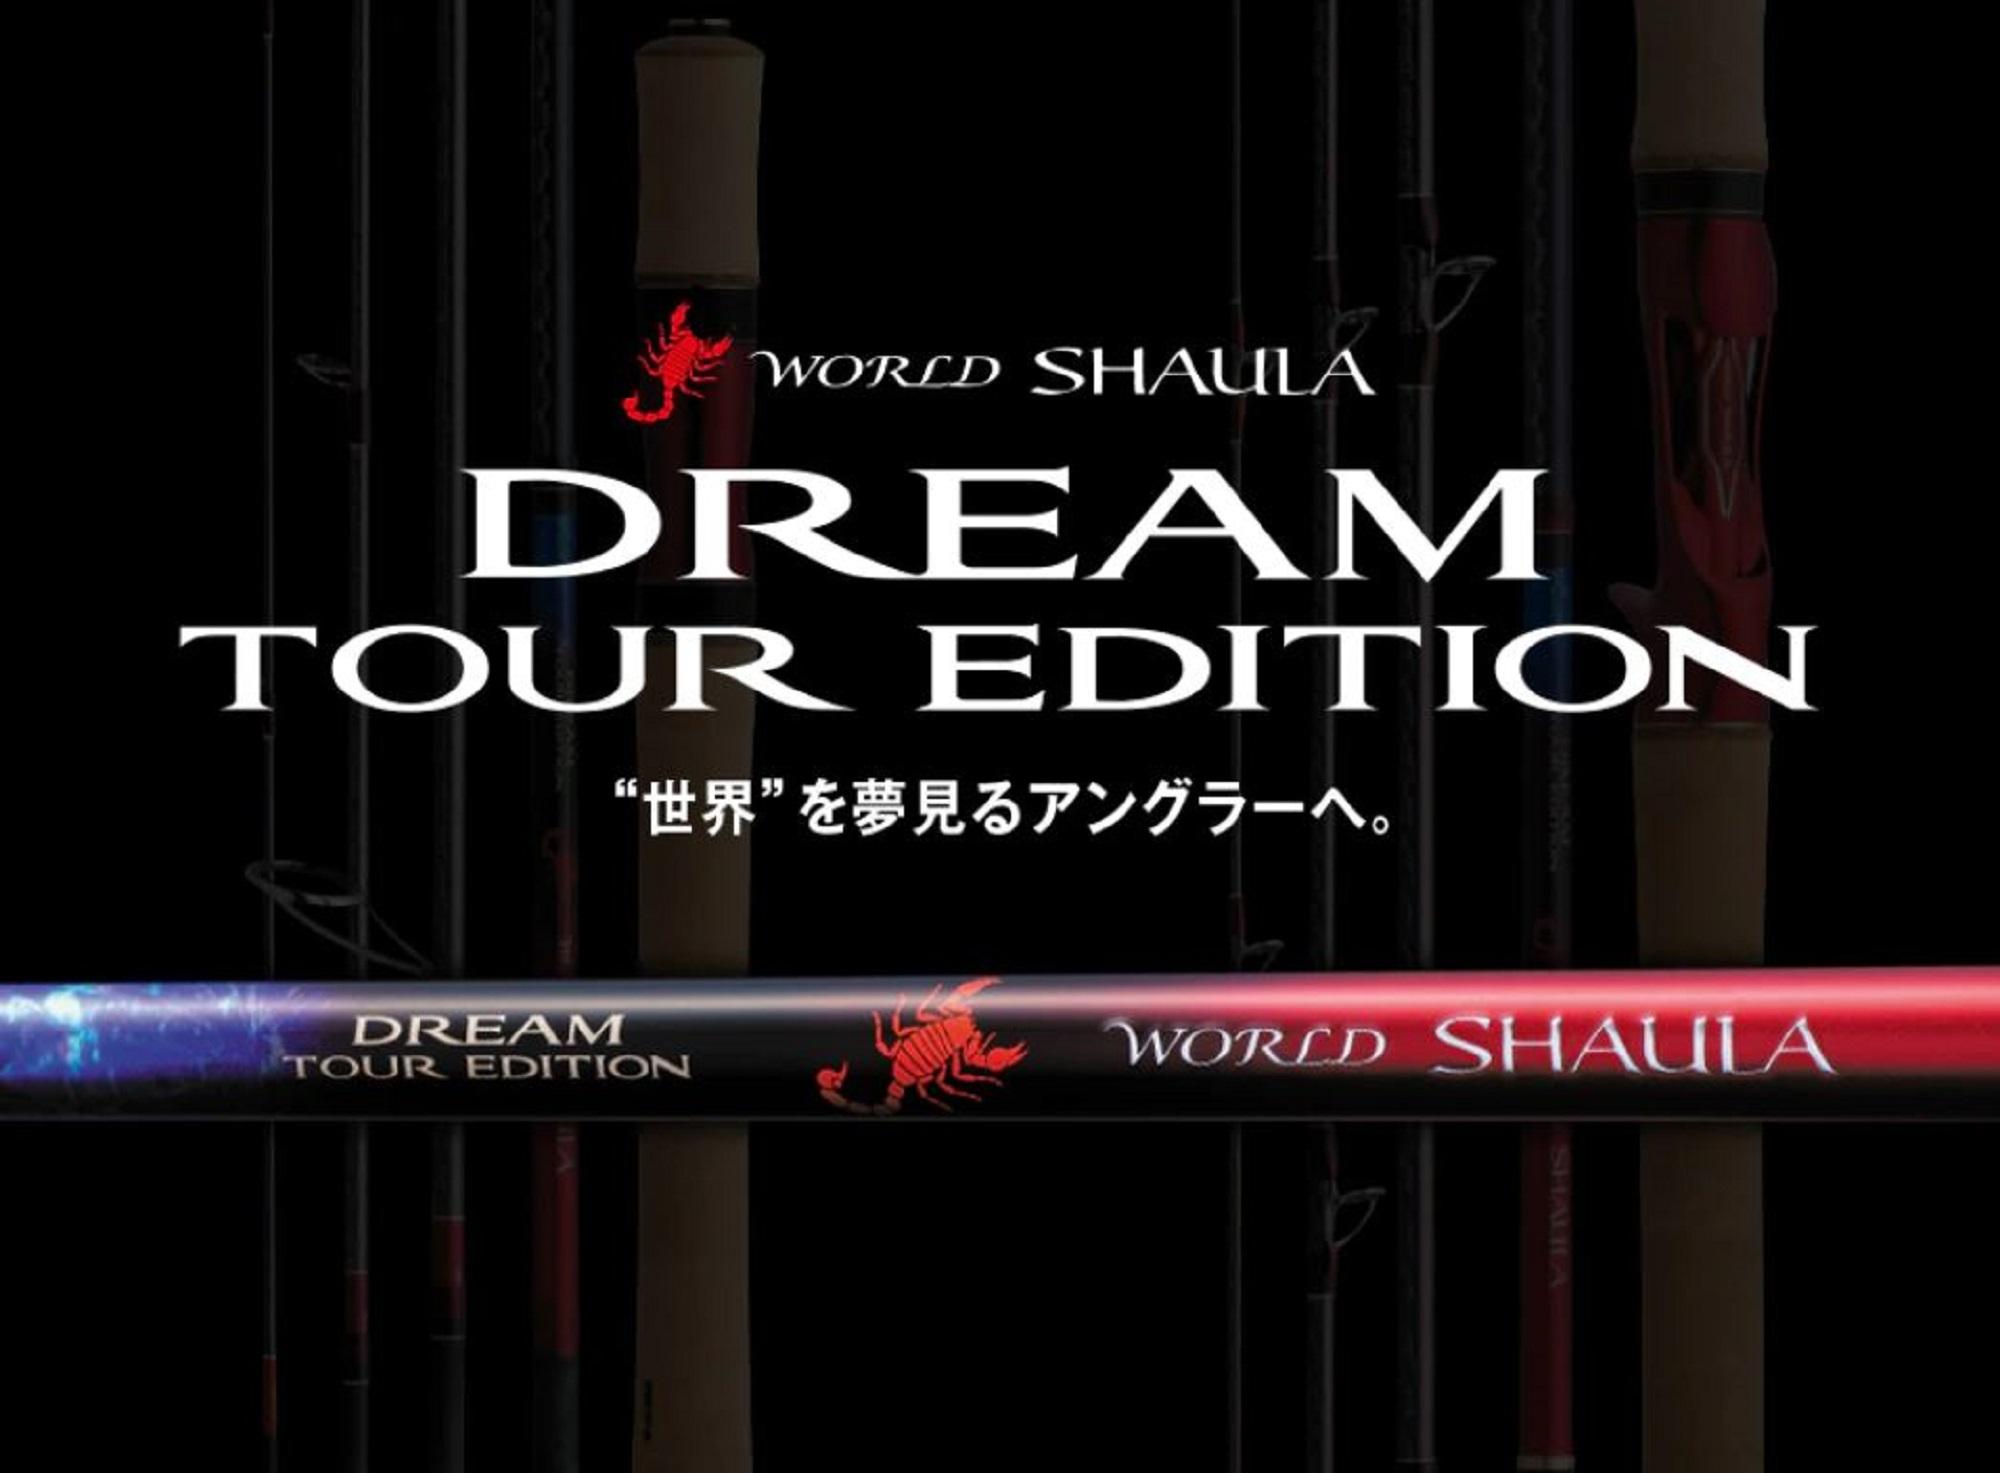 Shimano Rod Spinning World Shaula Dream Tour 2833RS-5 Travel Rod 378996